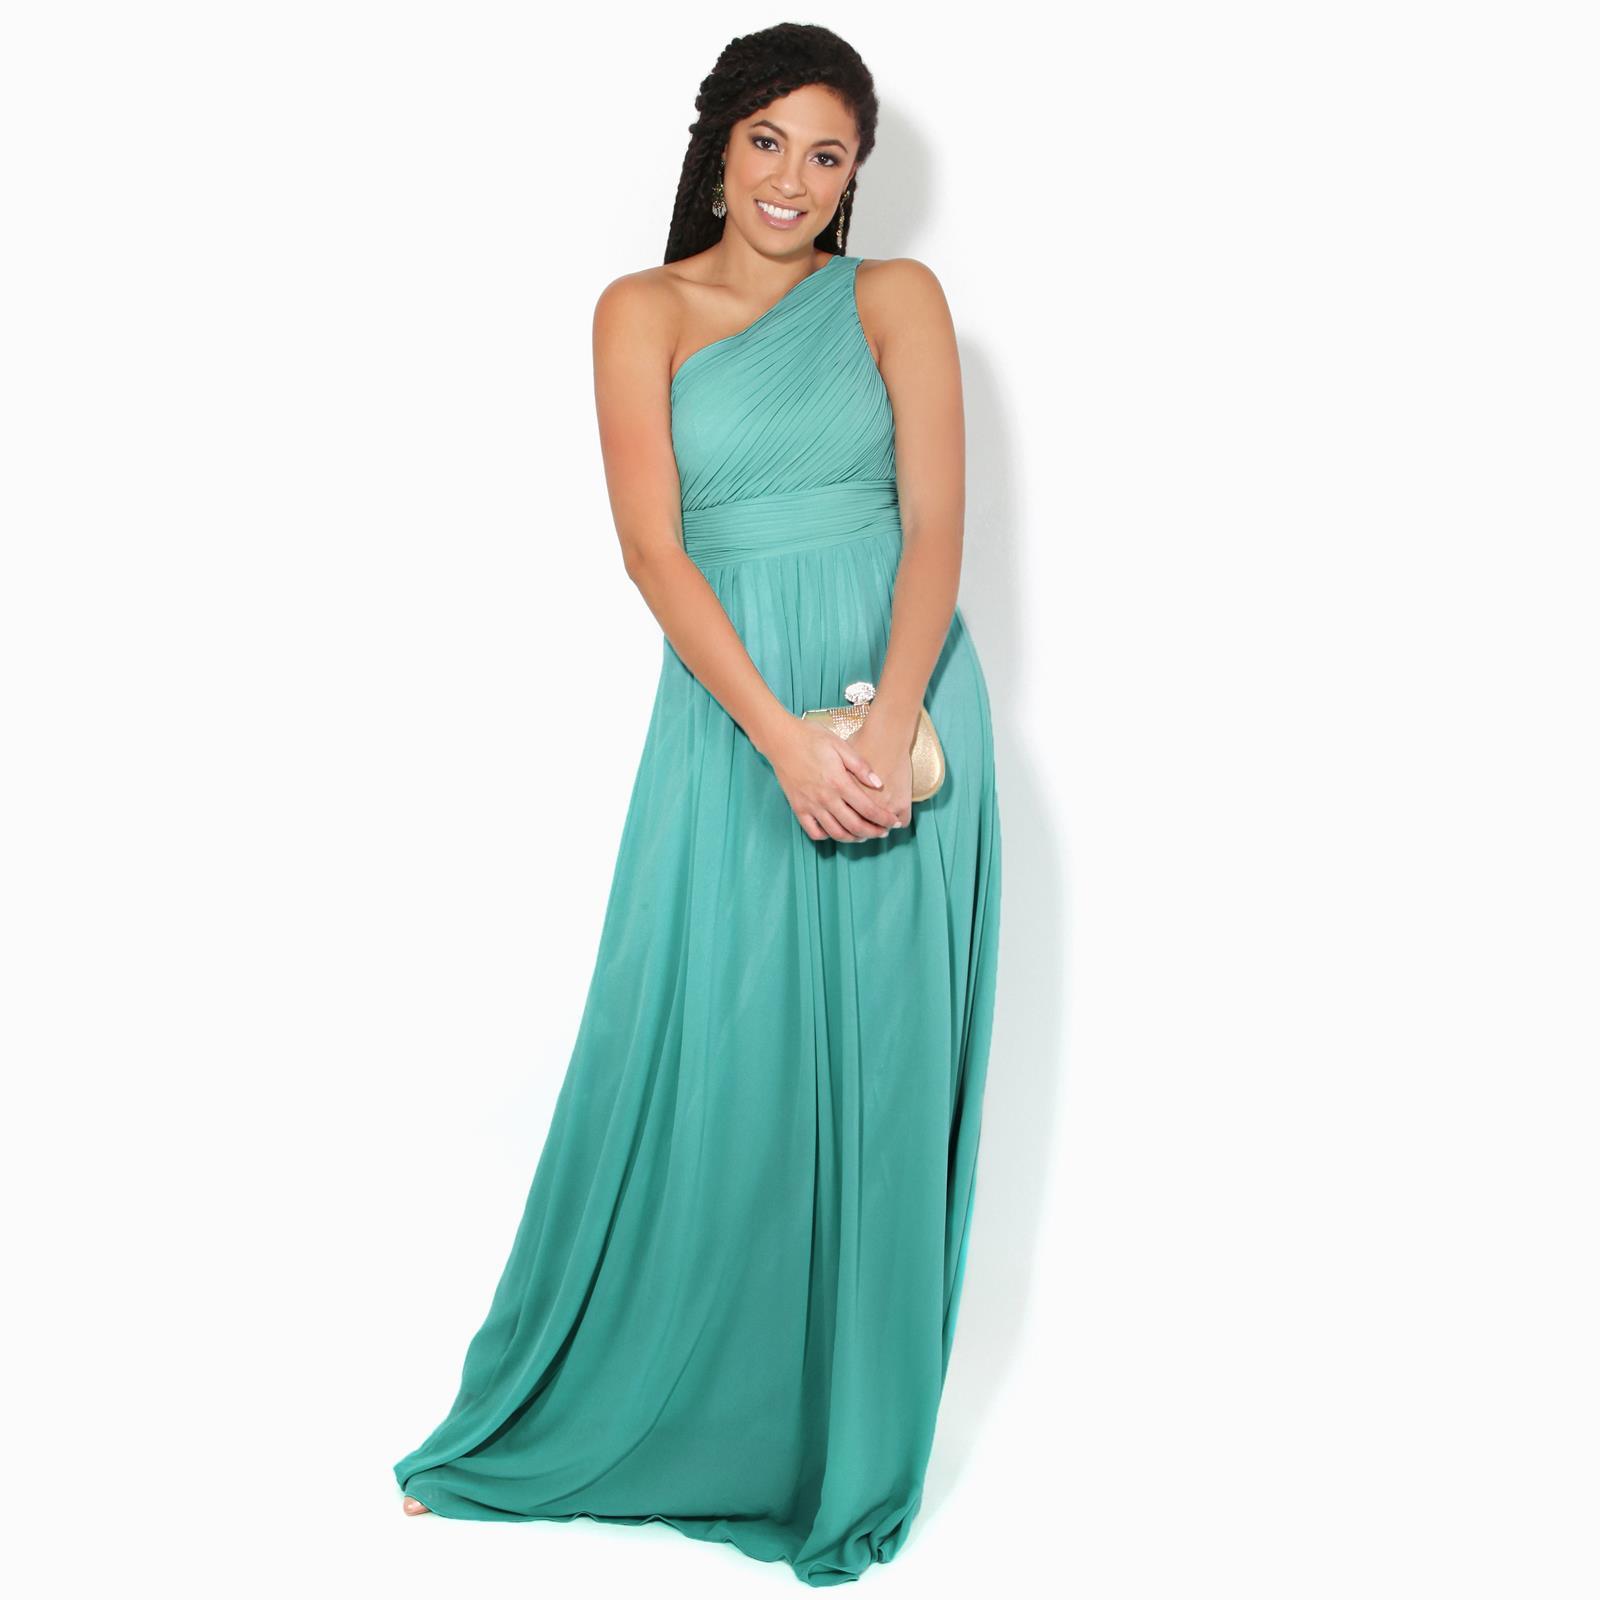 Womens-Wedding-Bridesmaid-Prom-Dress-Formal-One-Off-Shoulder-Long-Evening-8-18 thumbnail 73